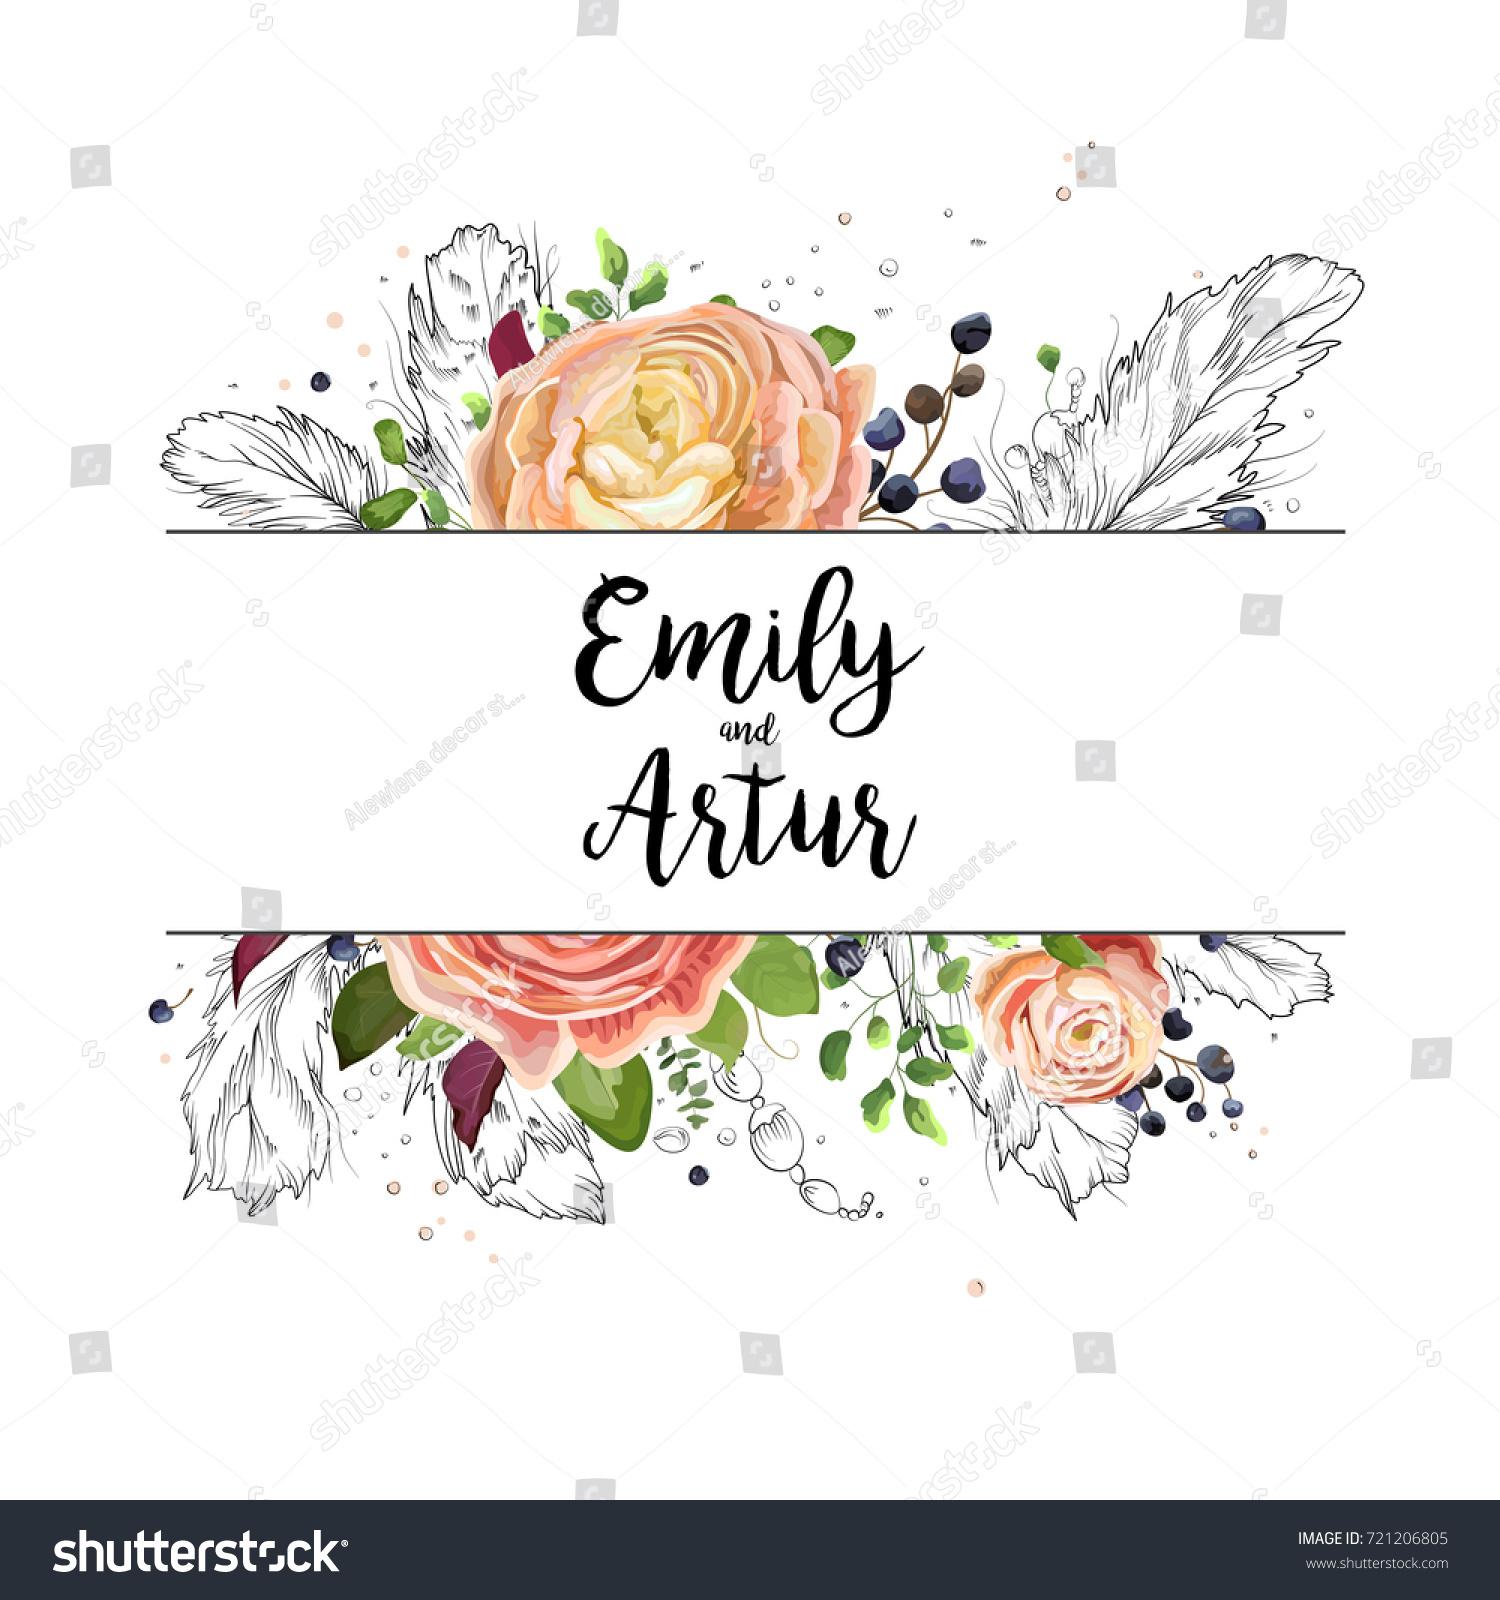 Wedding Card Design Line Art : Wedding watercolor boho invitation card design stock